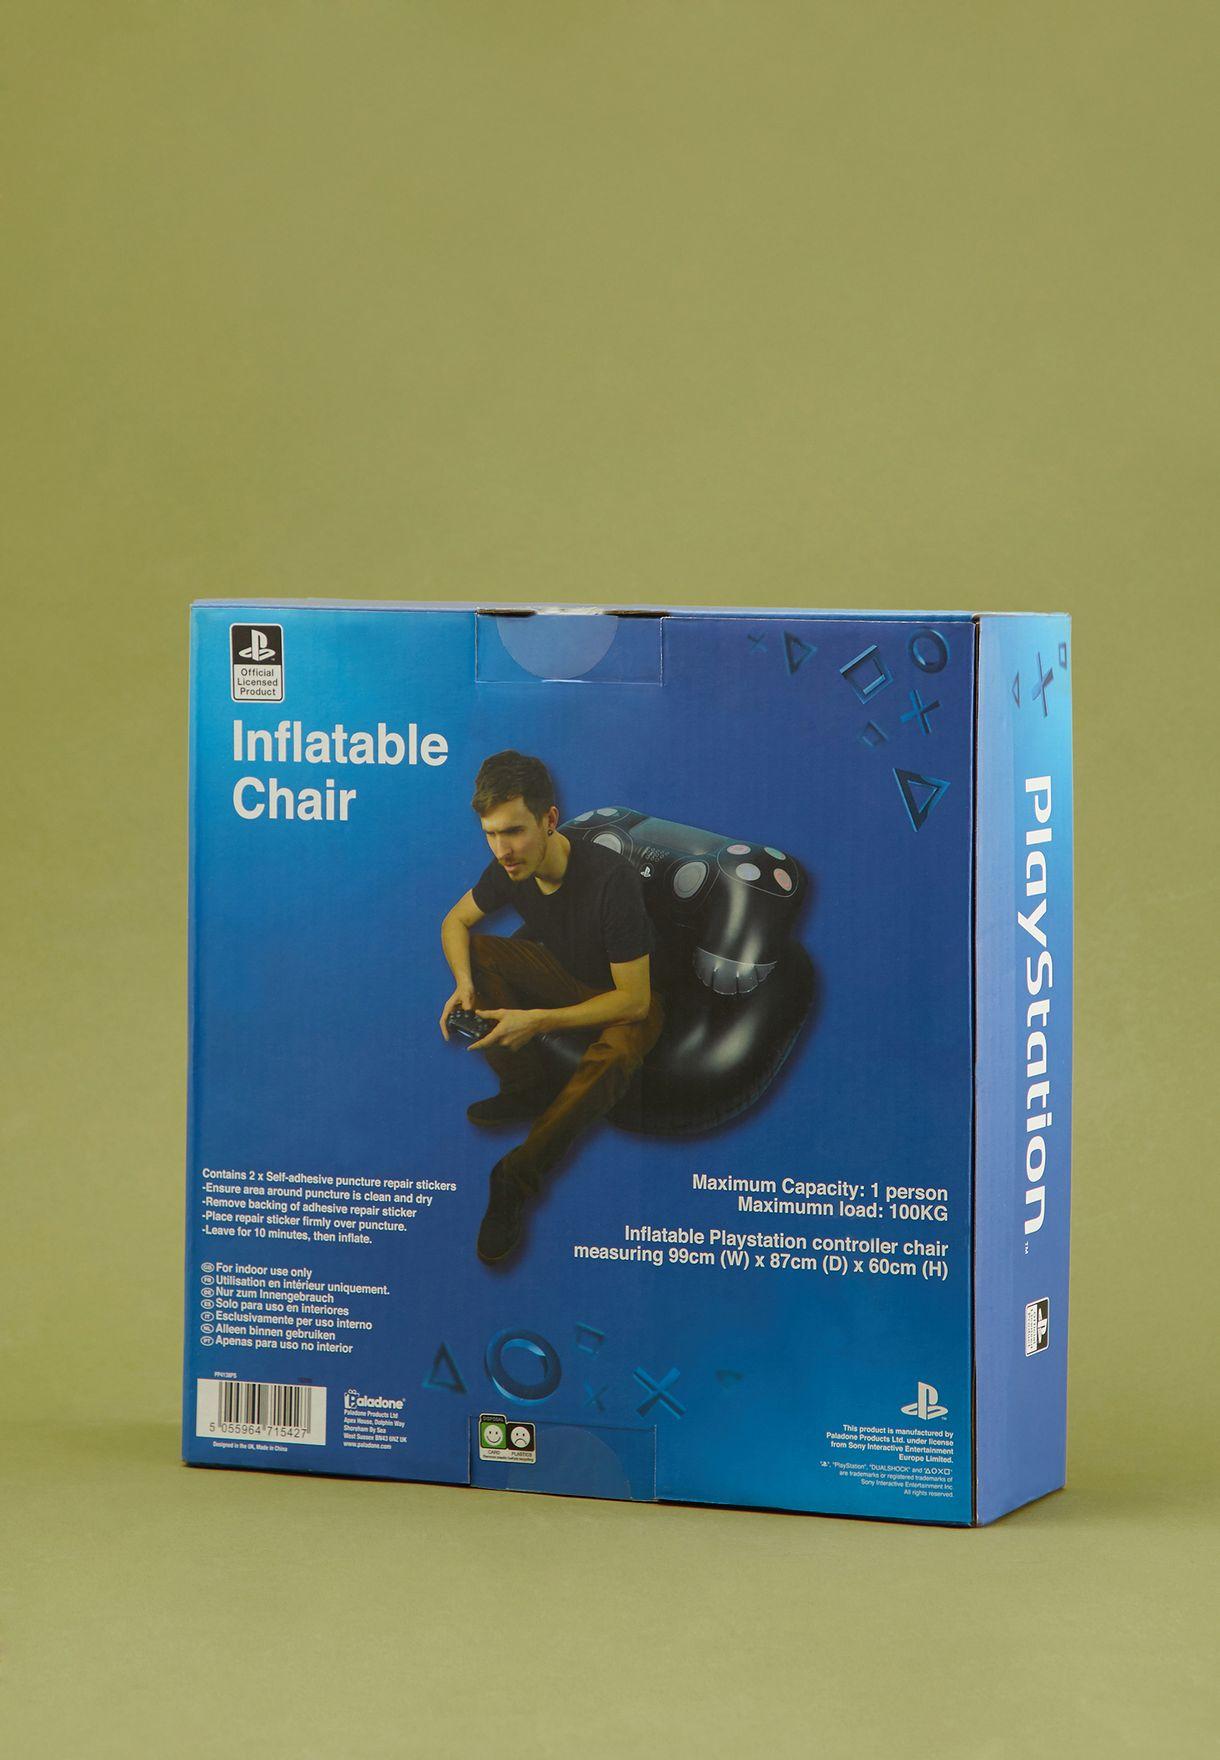 كرسي قابل للنفخ بشكل وحدة تحكم بلاي ستيشن